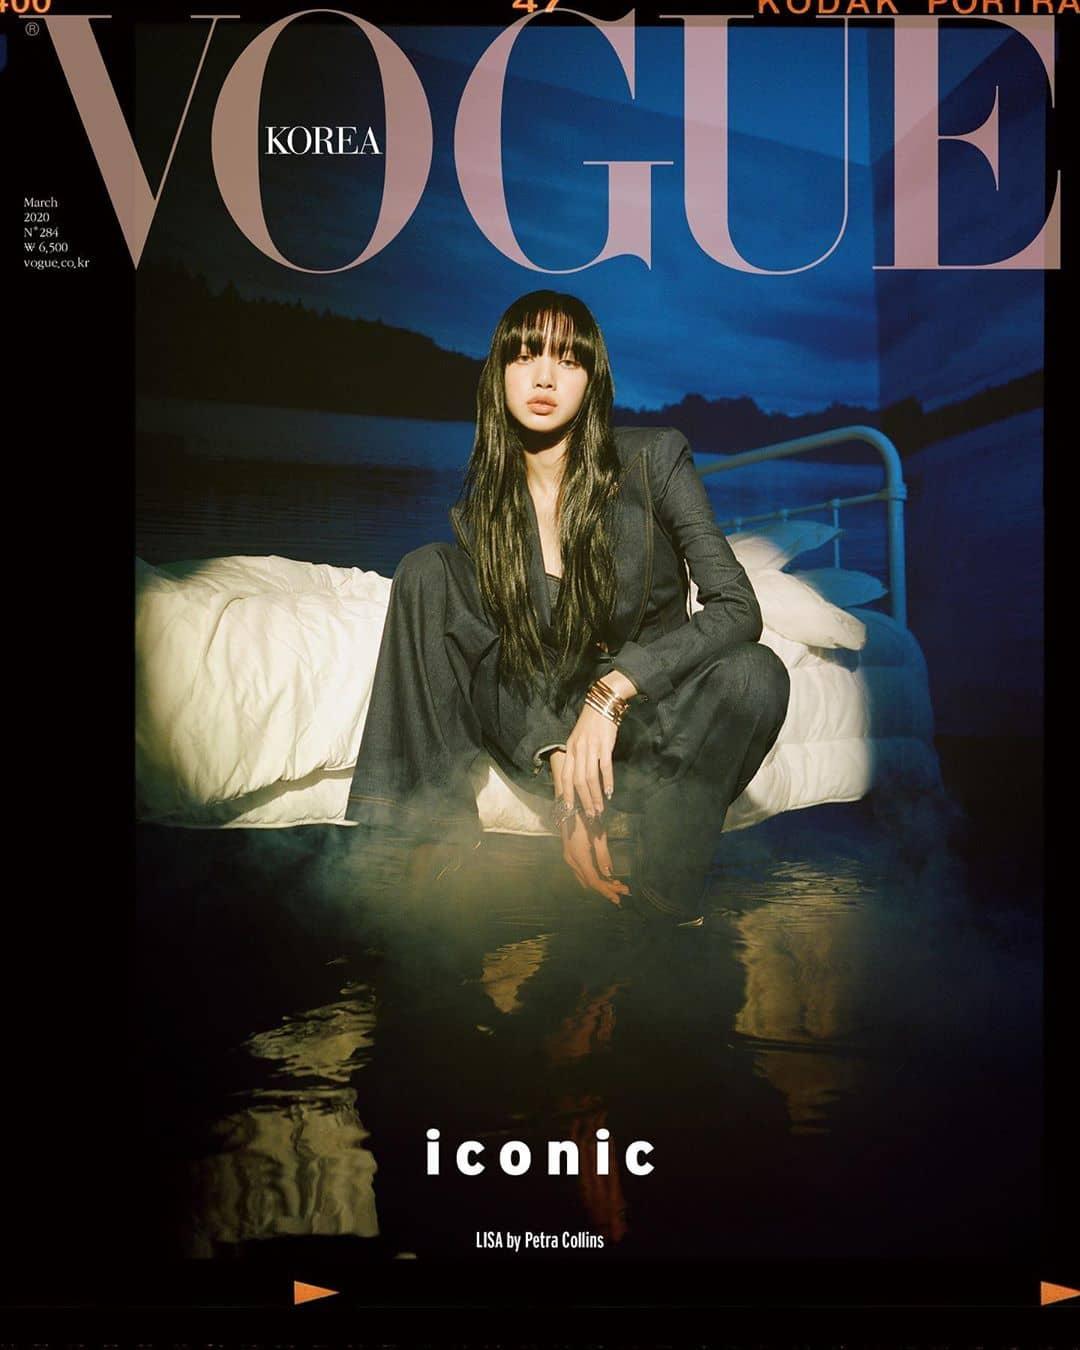 BLACKPINK Lisa on the cover of Vogue Korea